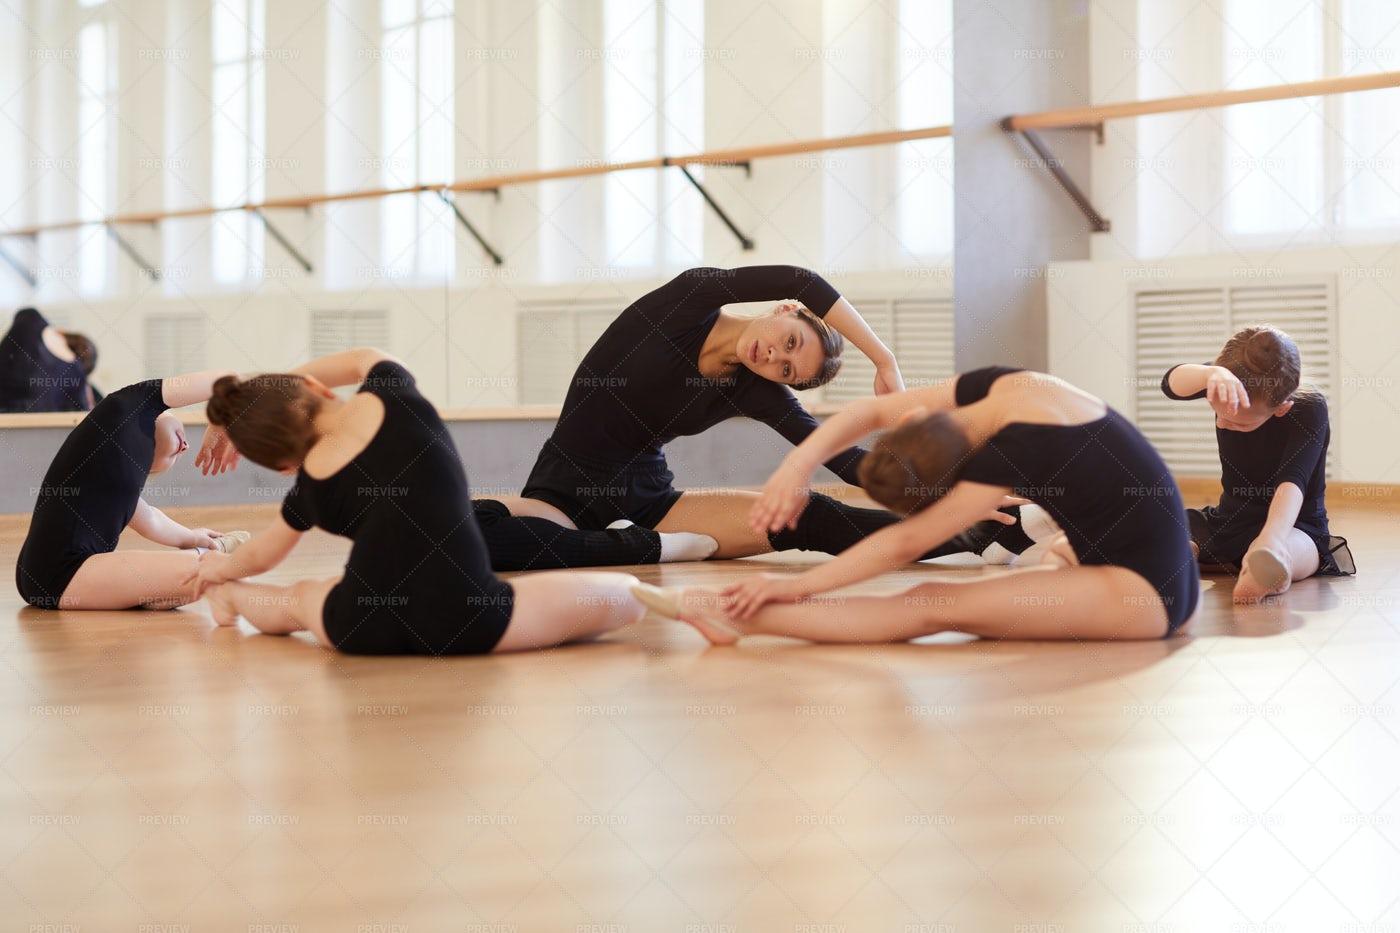 Girls  Stretching In Dance Studio: Stock Photos